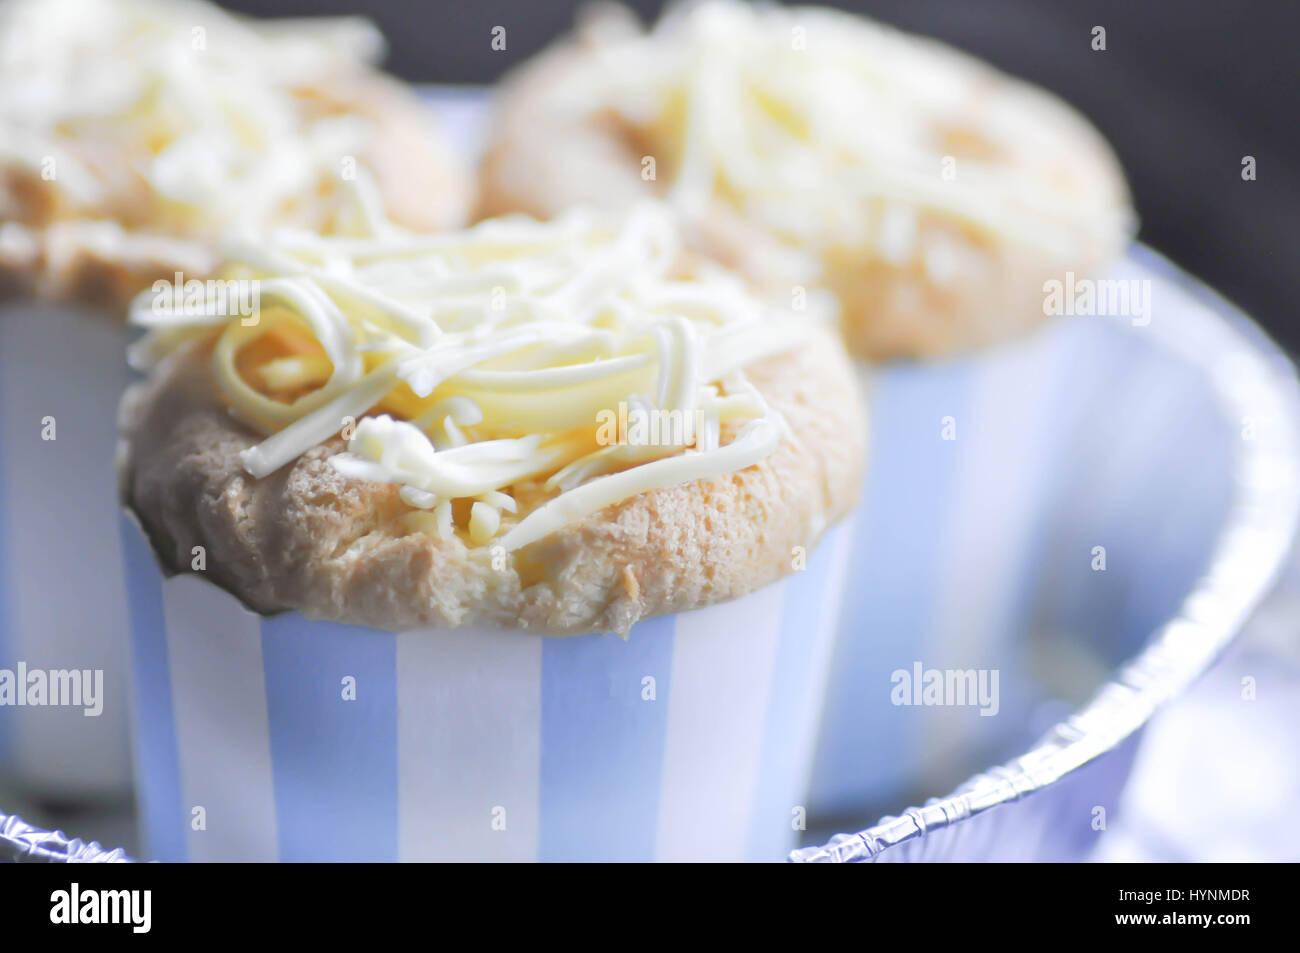 mamon or filipino sponge cake or cup cake - Stock Image